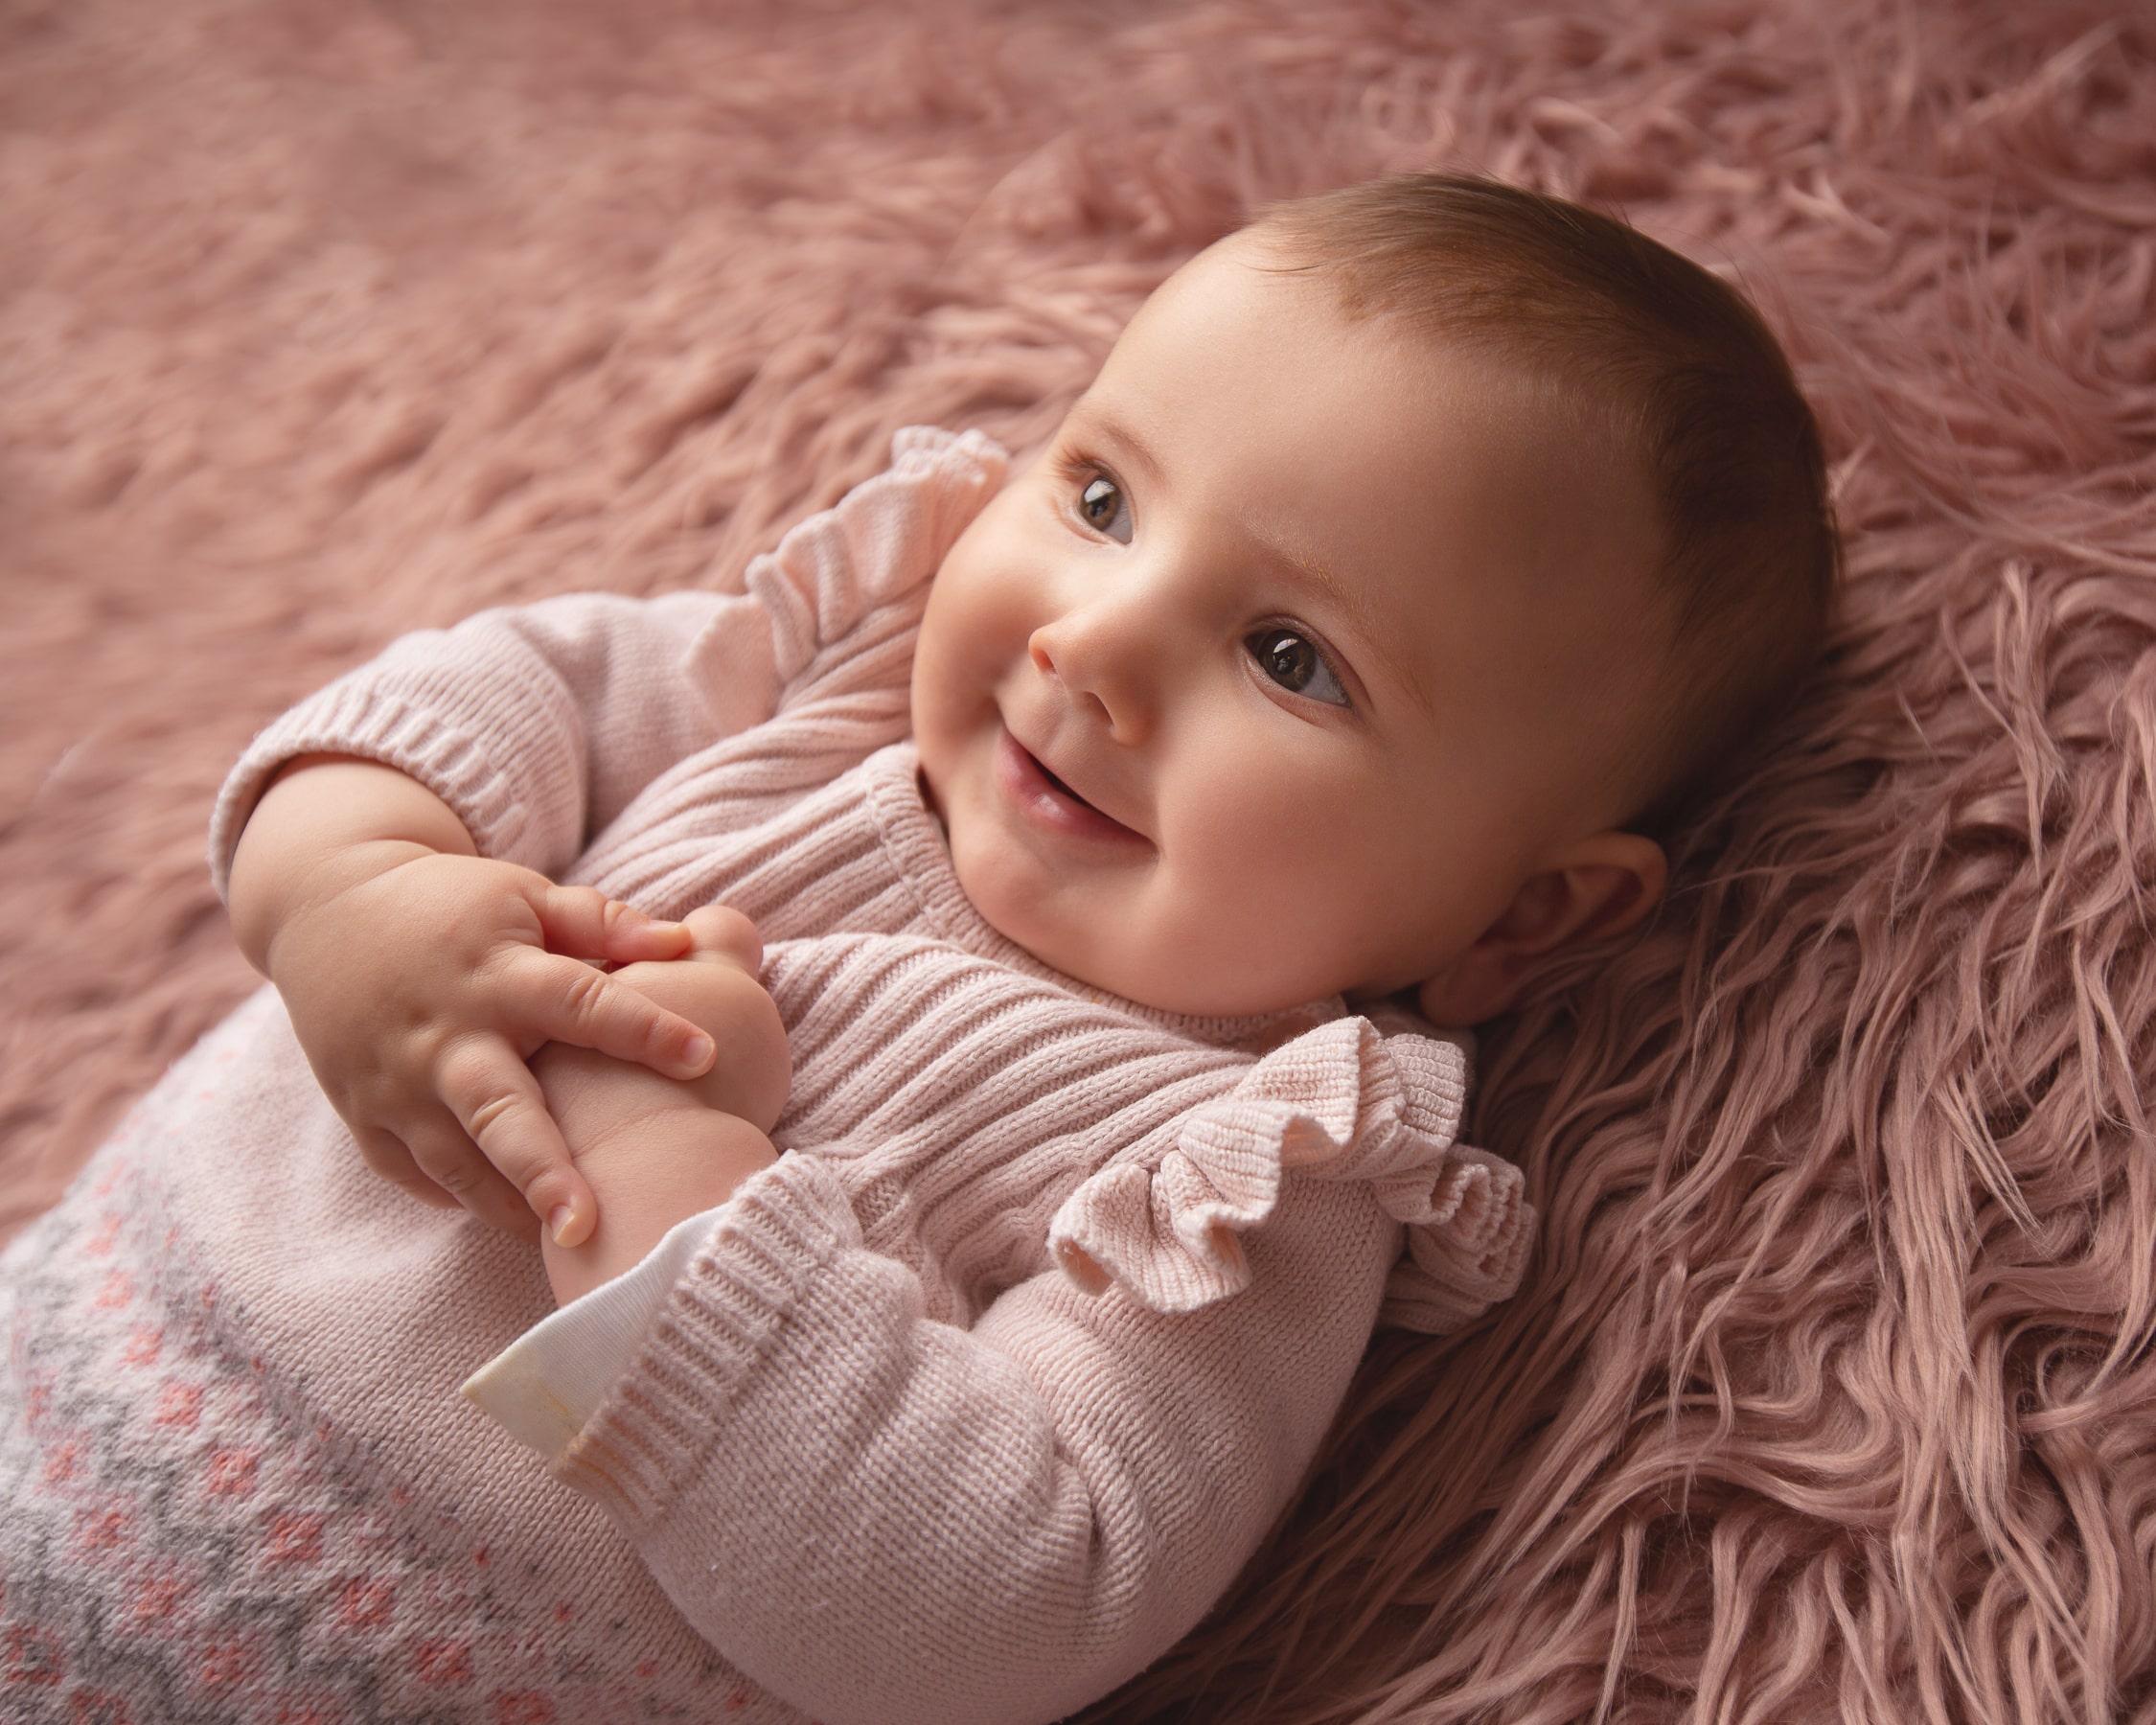 st albans baby photographerr